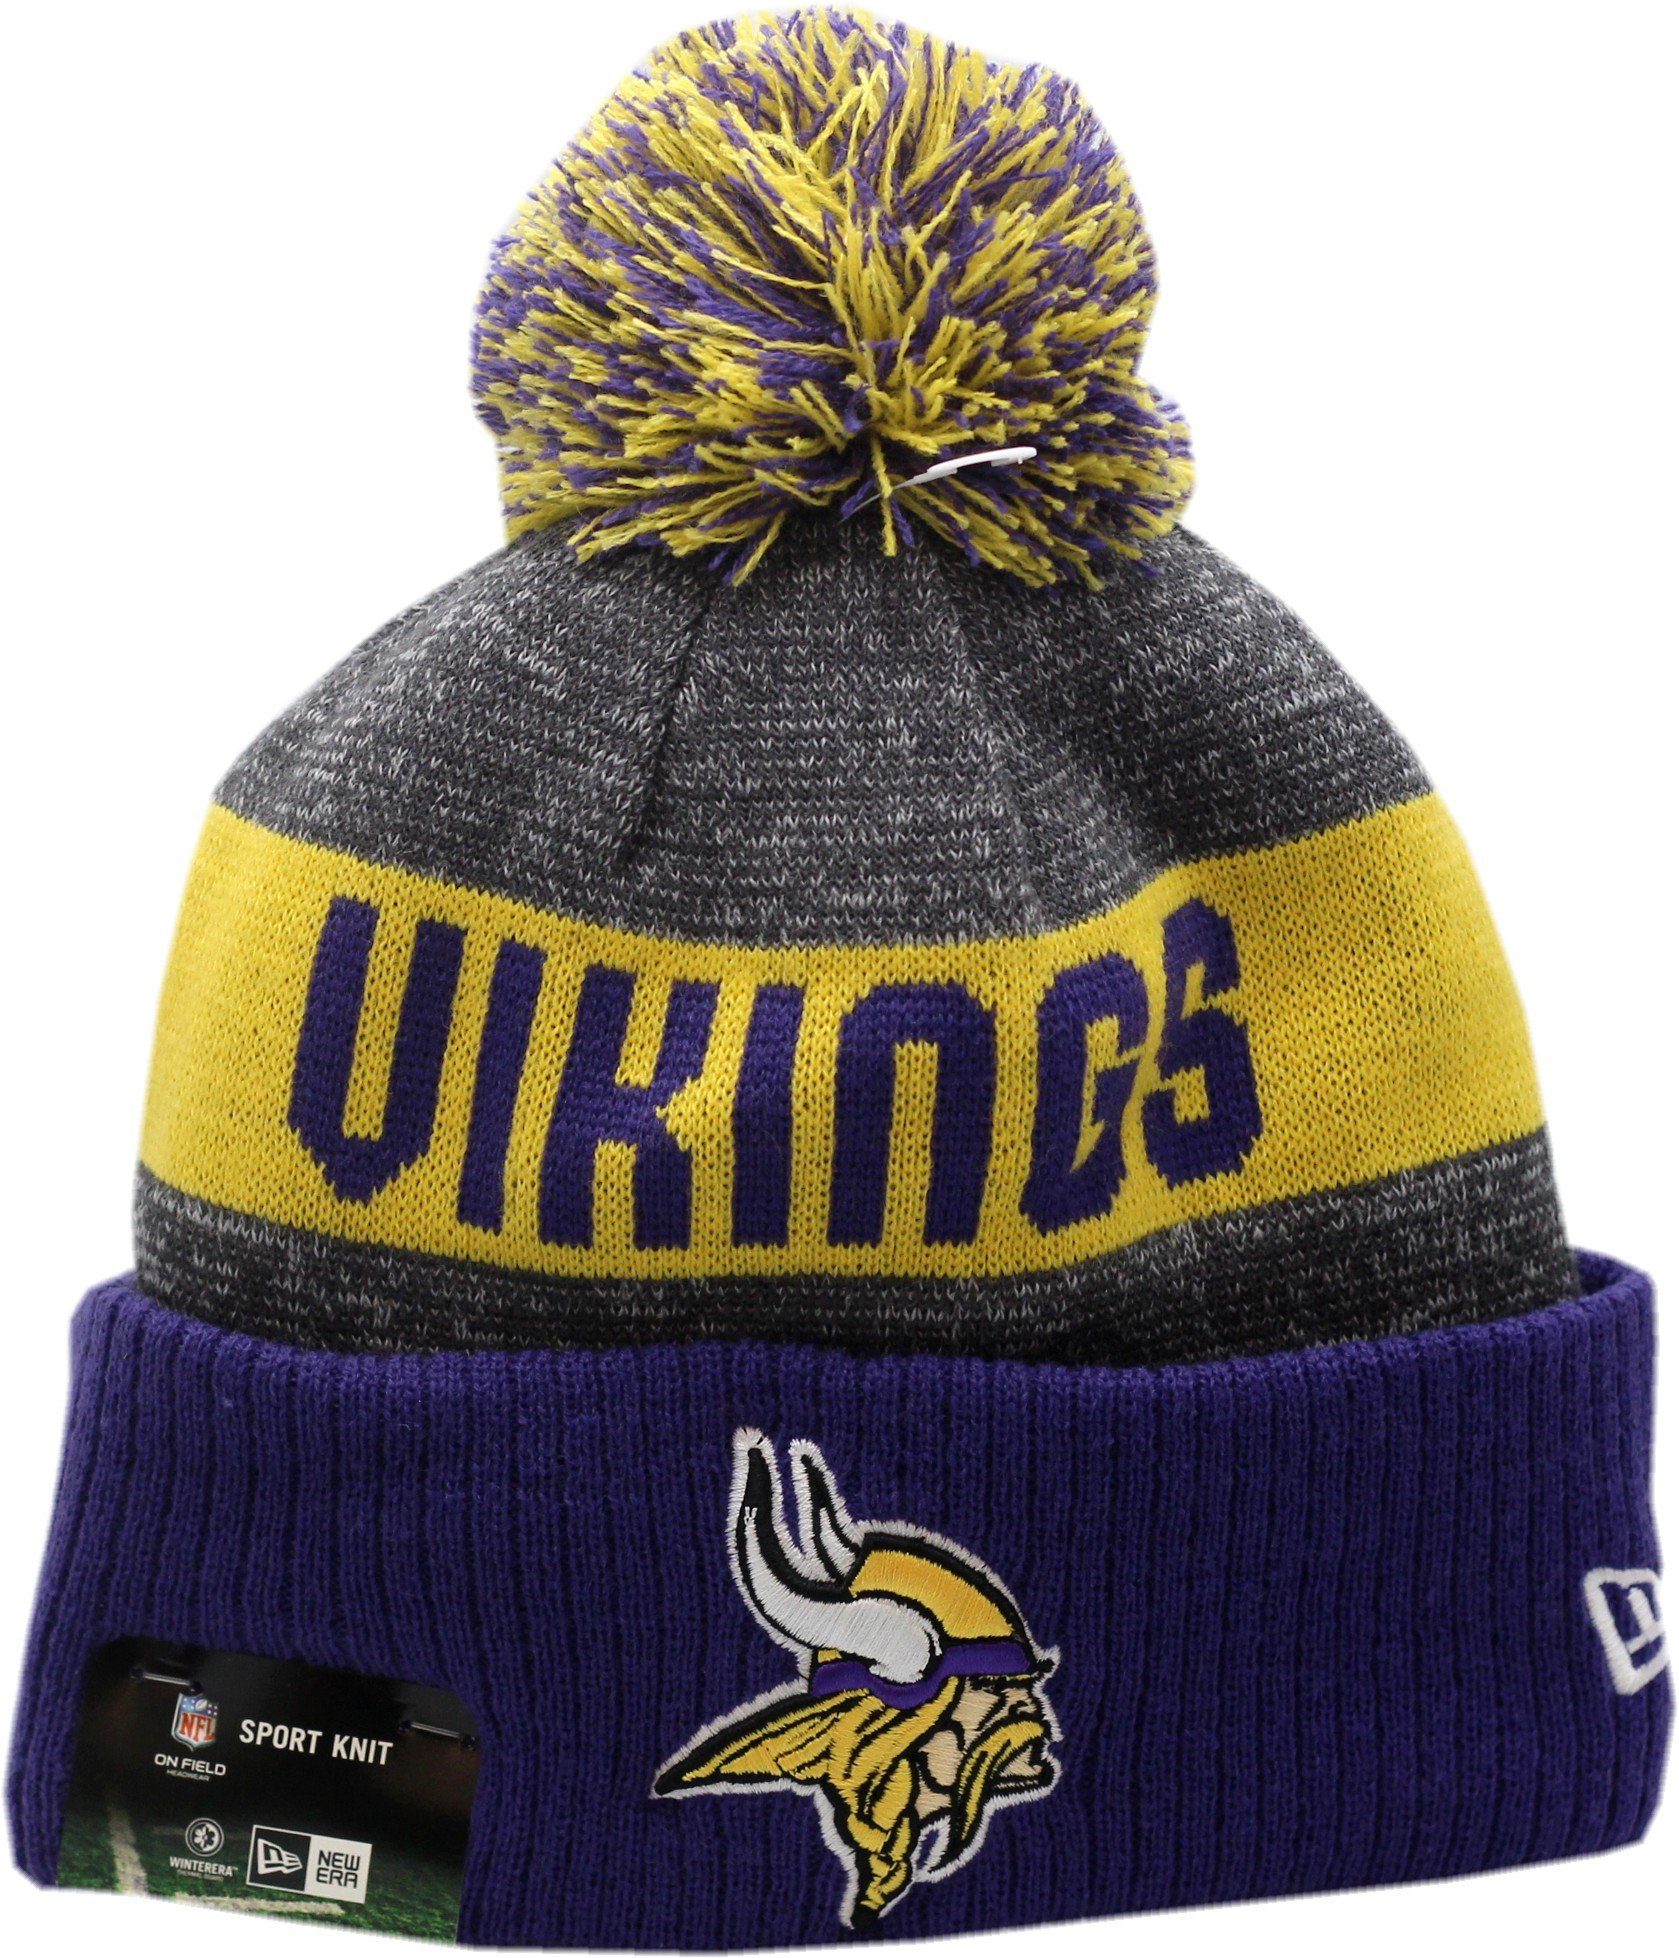 705acca1e where to buy minnesota vikings knit hat 07d81 ef423